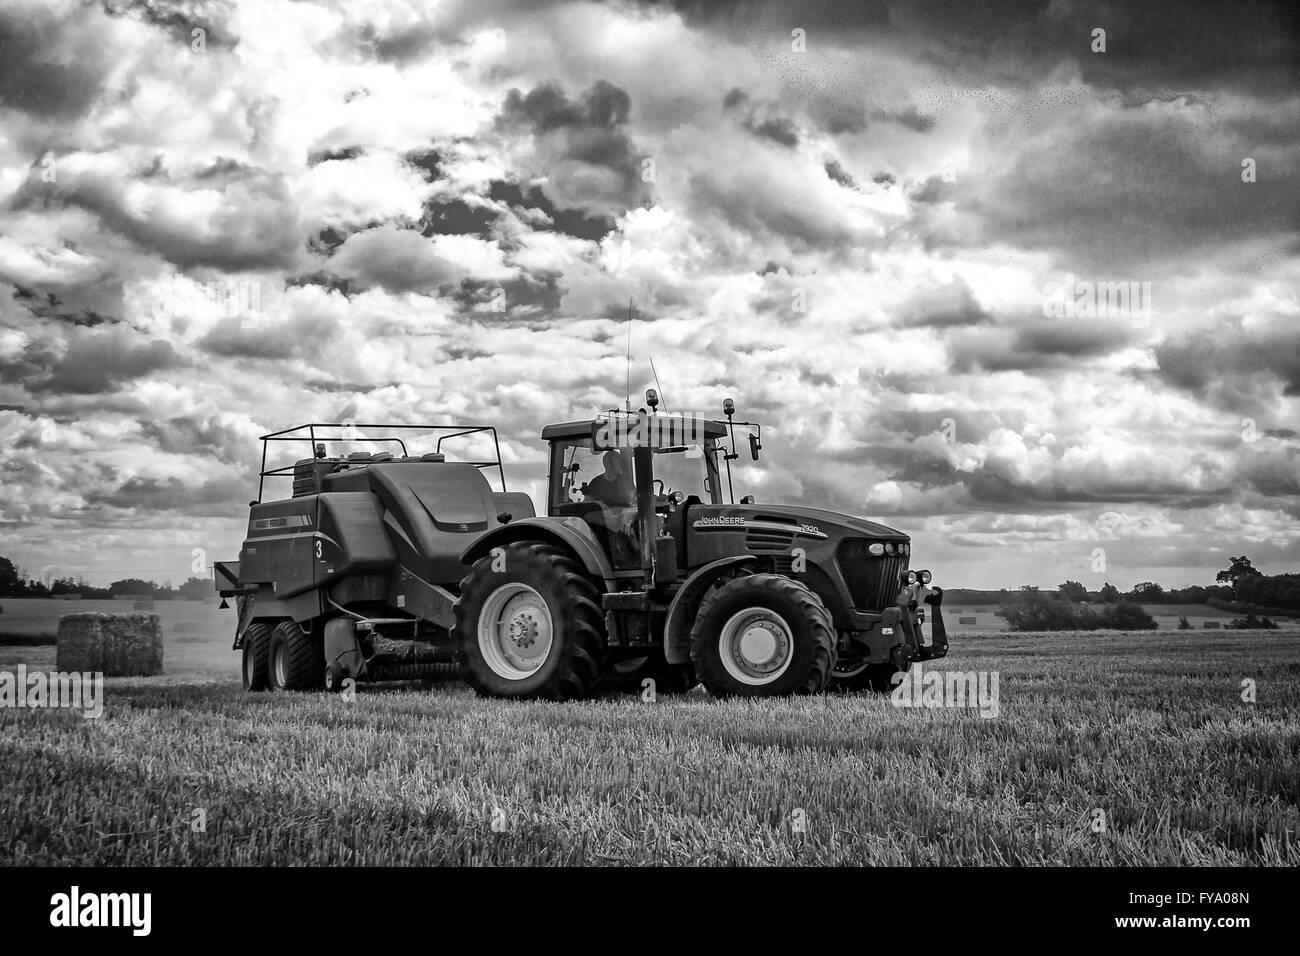 Farm, farming, countryside, Combine, Tractor, - Stock Image